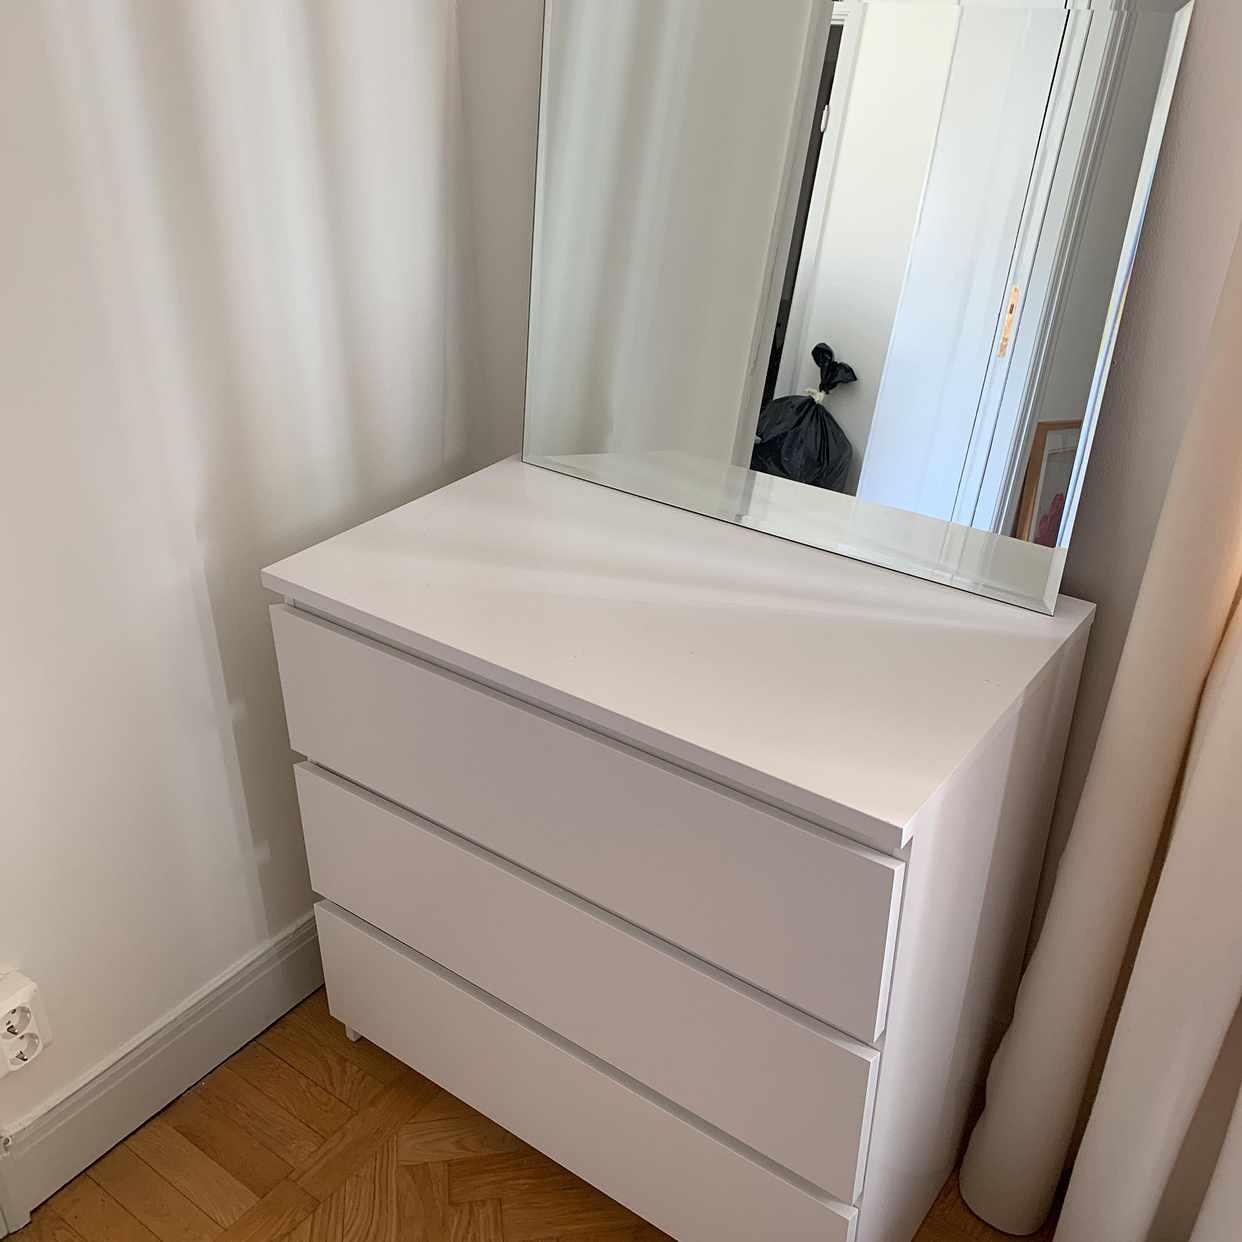 image of Byråer, speglar, sängbord - Stockholm